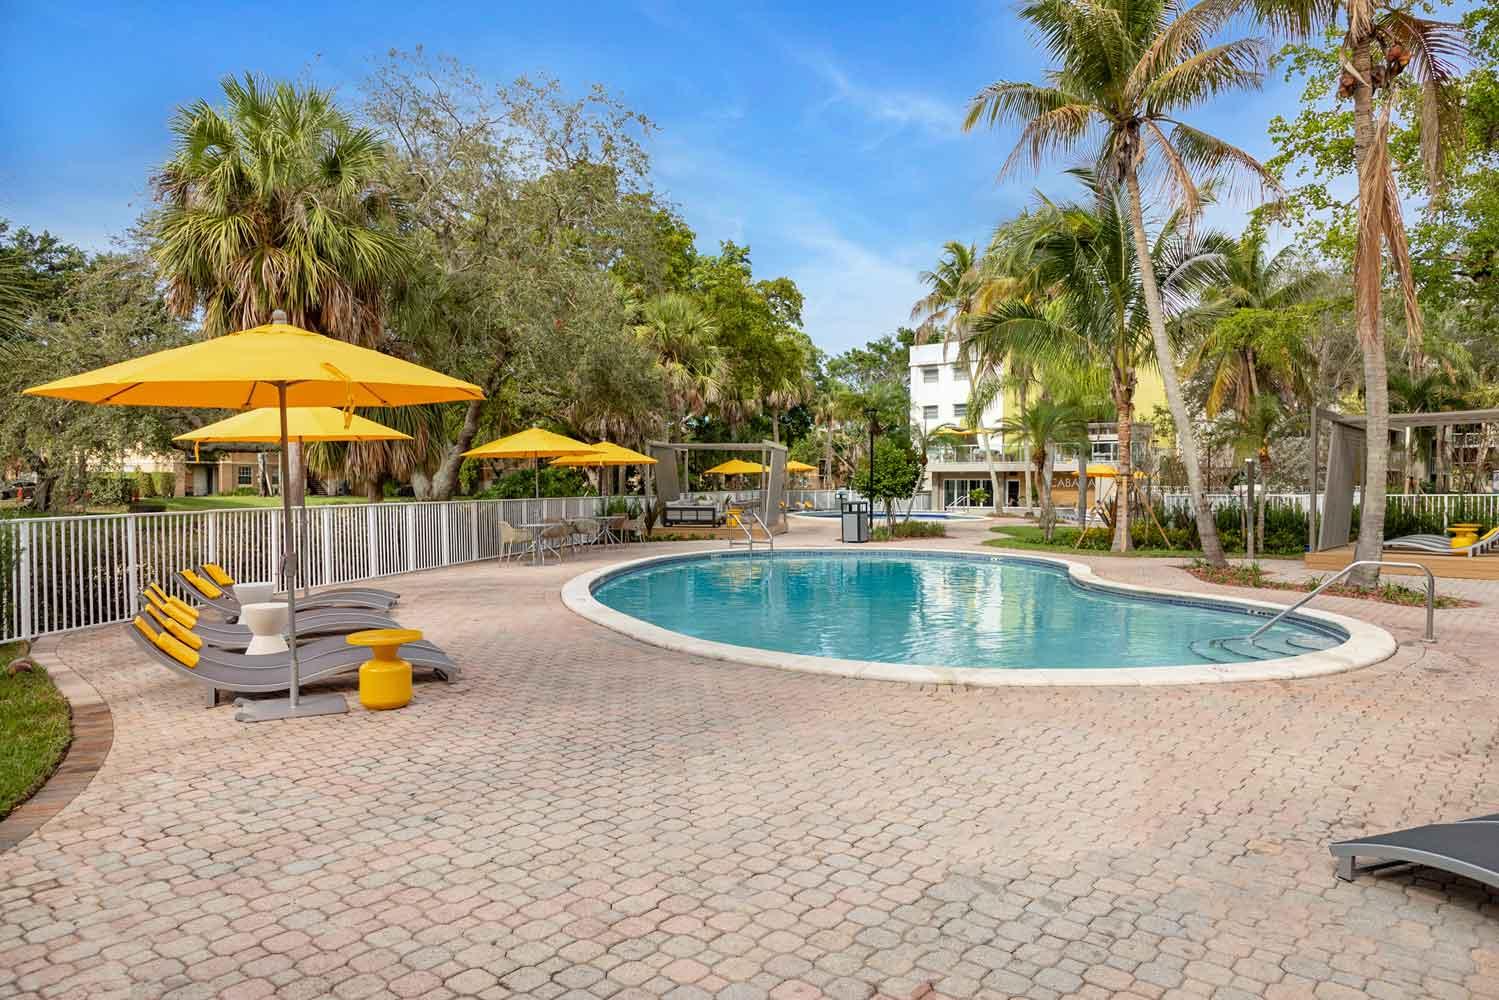 Lagoon-Like Swimming Pool at Nottingham Pine Apartments in Plantation, FL